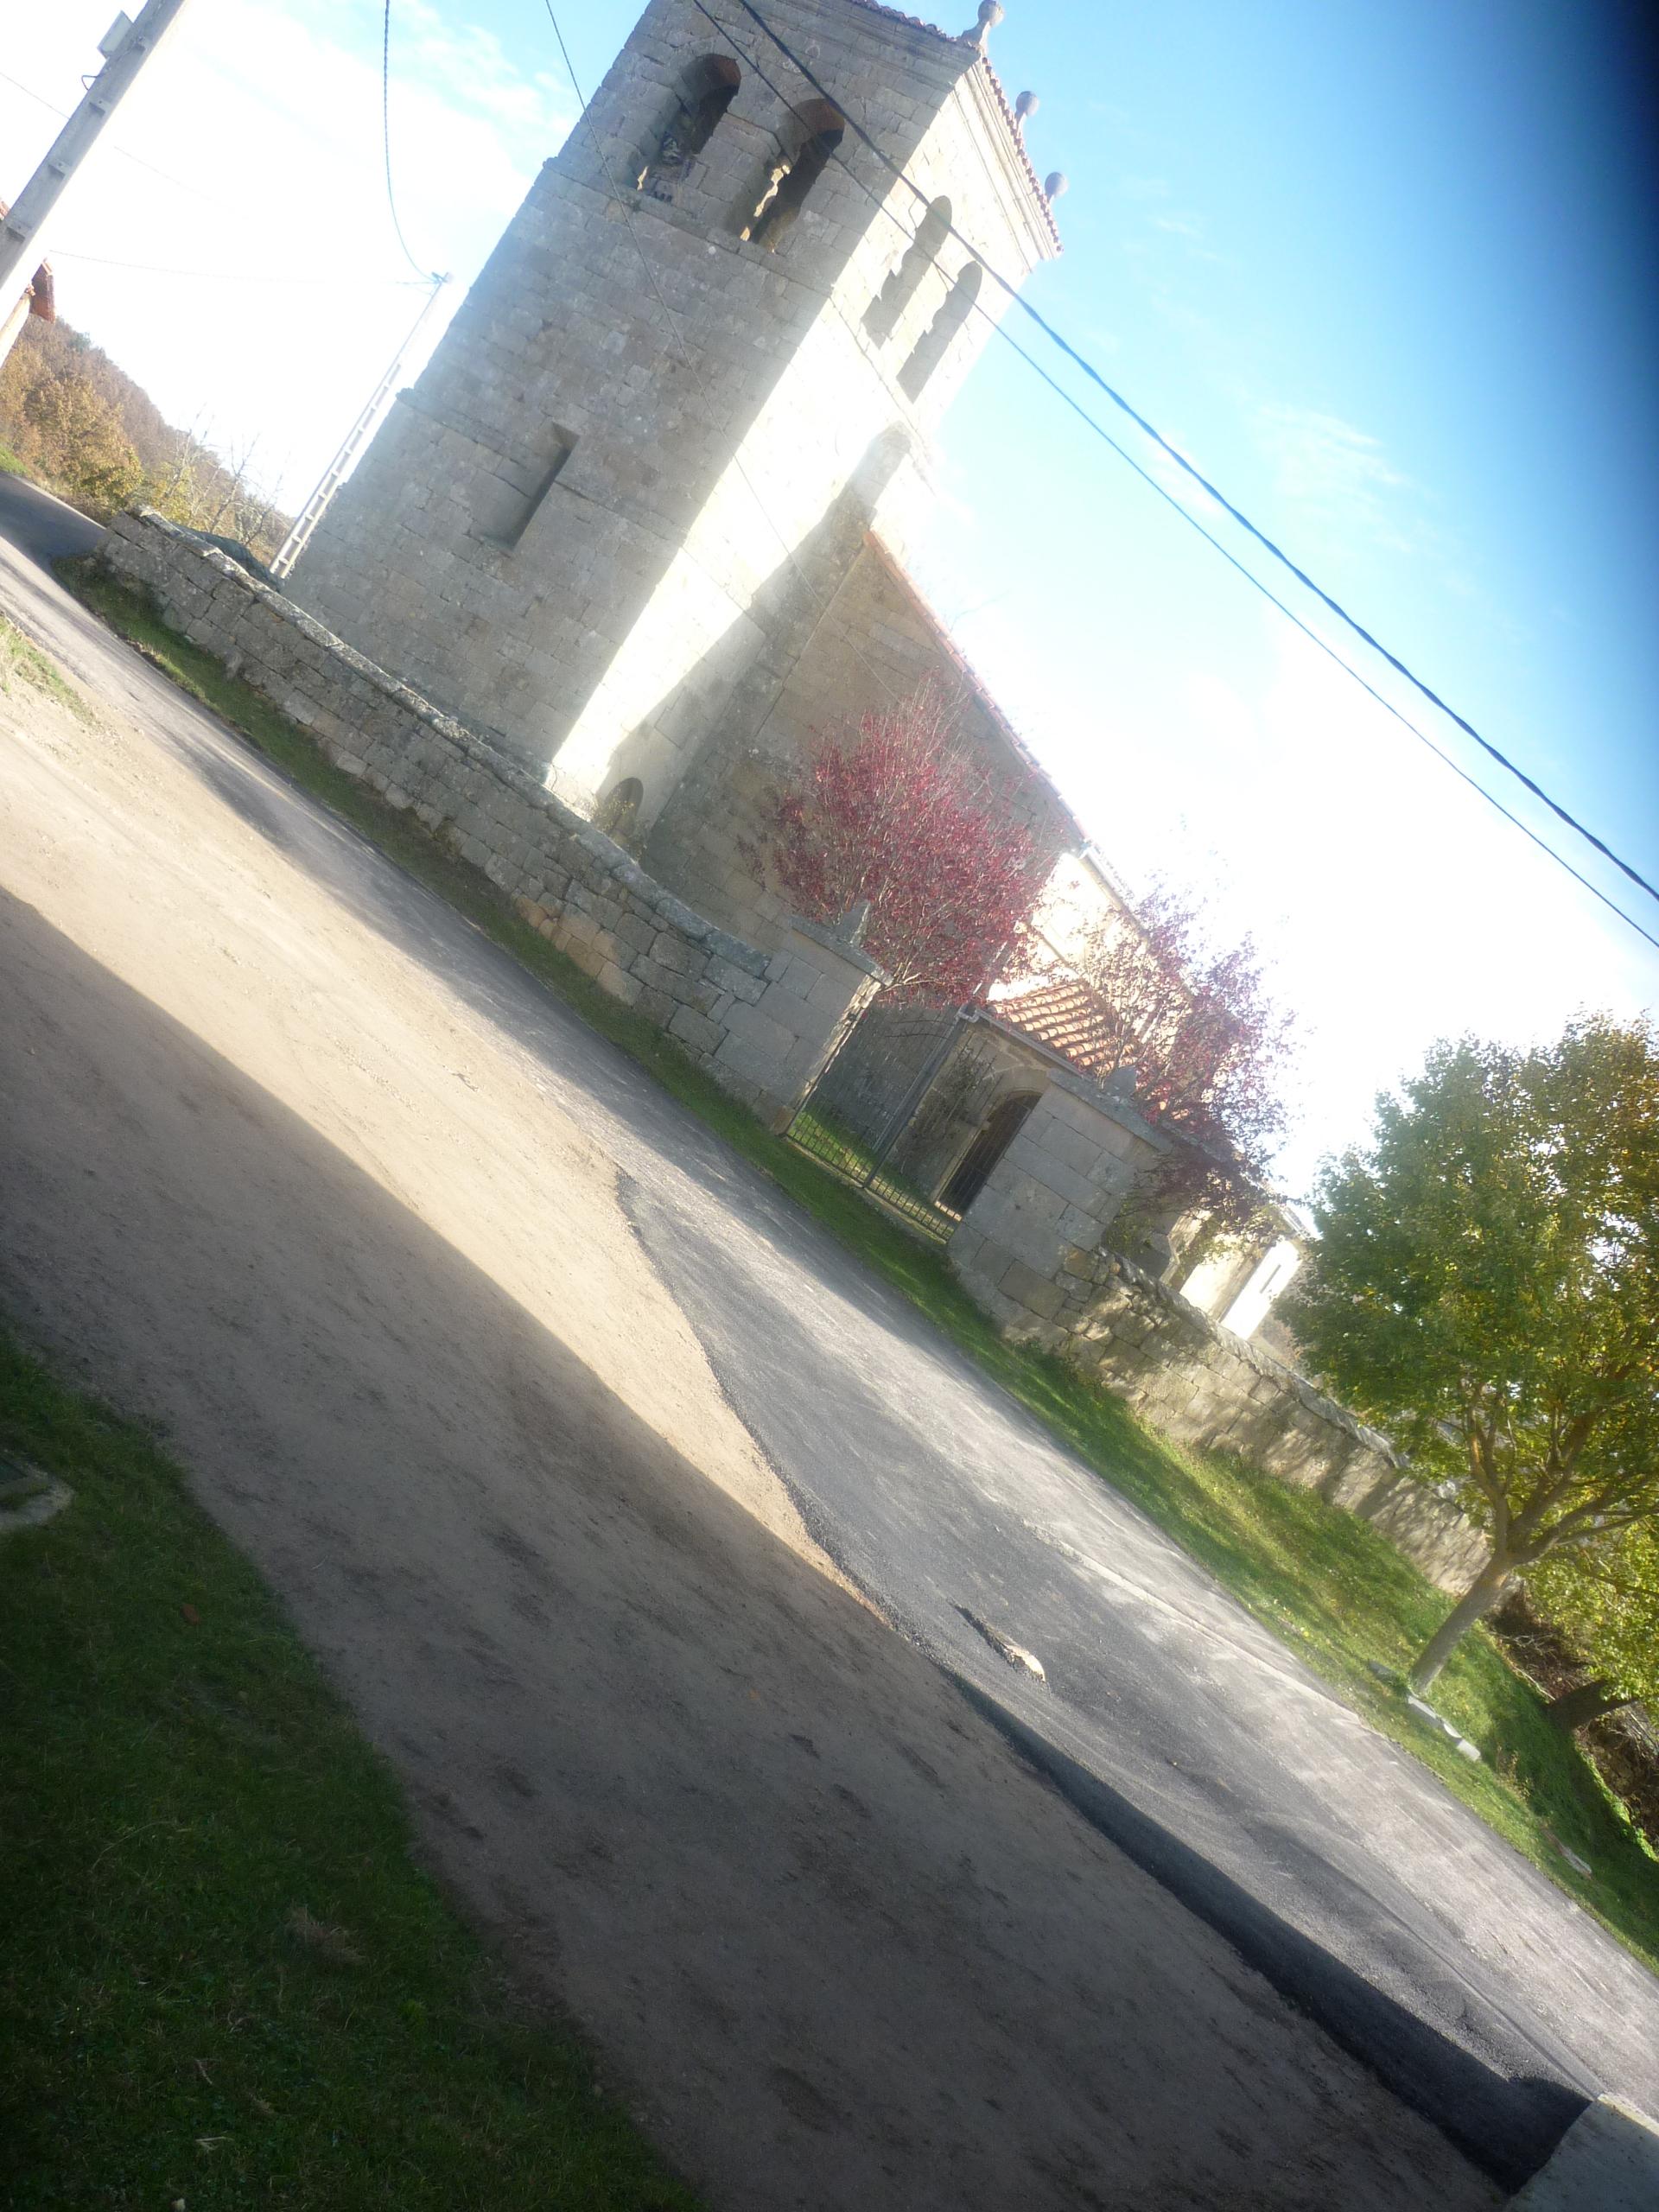 https://navamuel.es/images/CasasyCalles/Iglesia.jpg